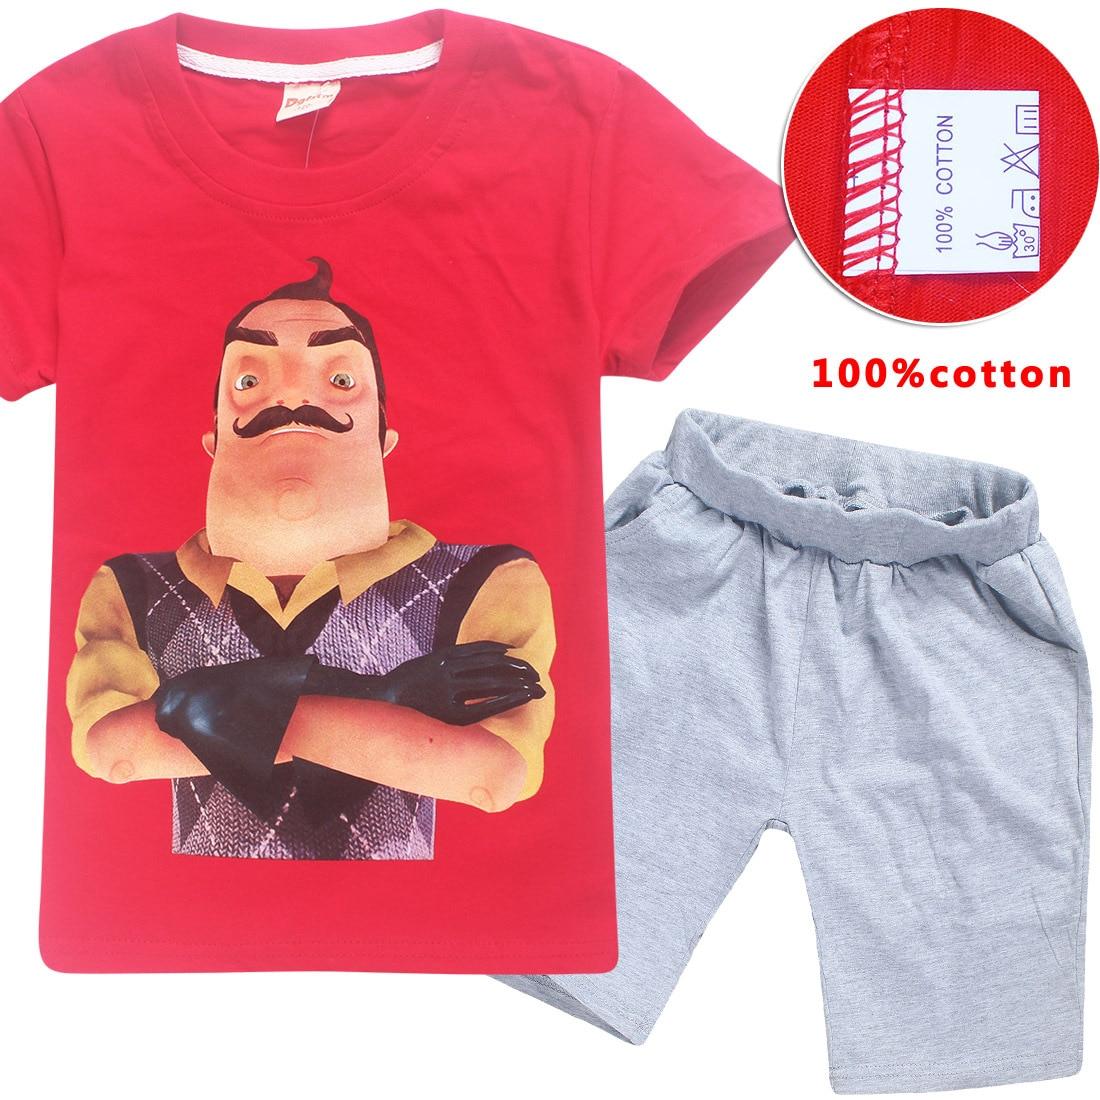 Z&Y 6-14Years Nununu 2018 The Hello Neighbor Clothing Set Boys Clothes Summer Girl Shirt Shorts Outfit Sportsuits 2pcs Shirt Set